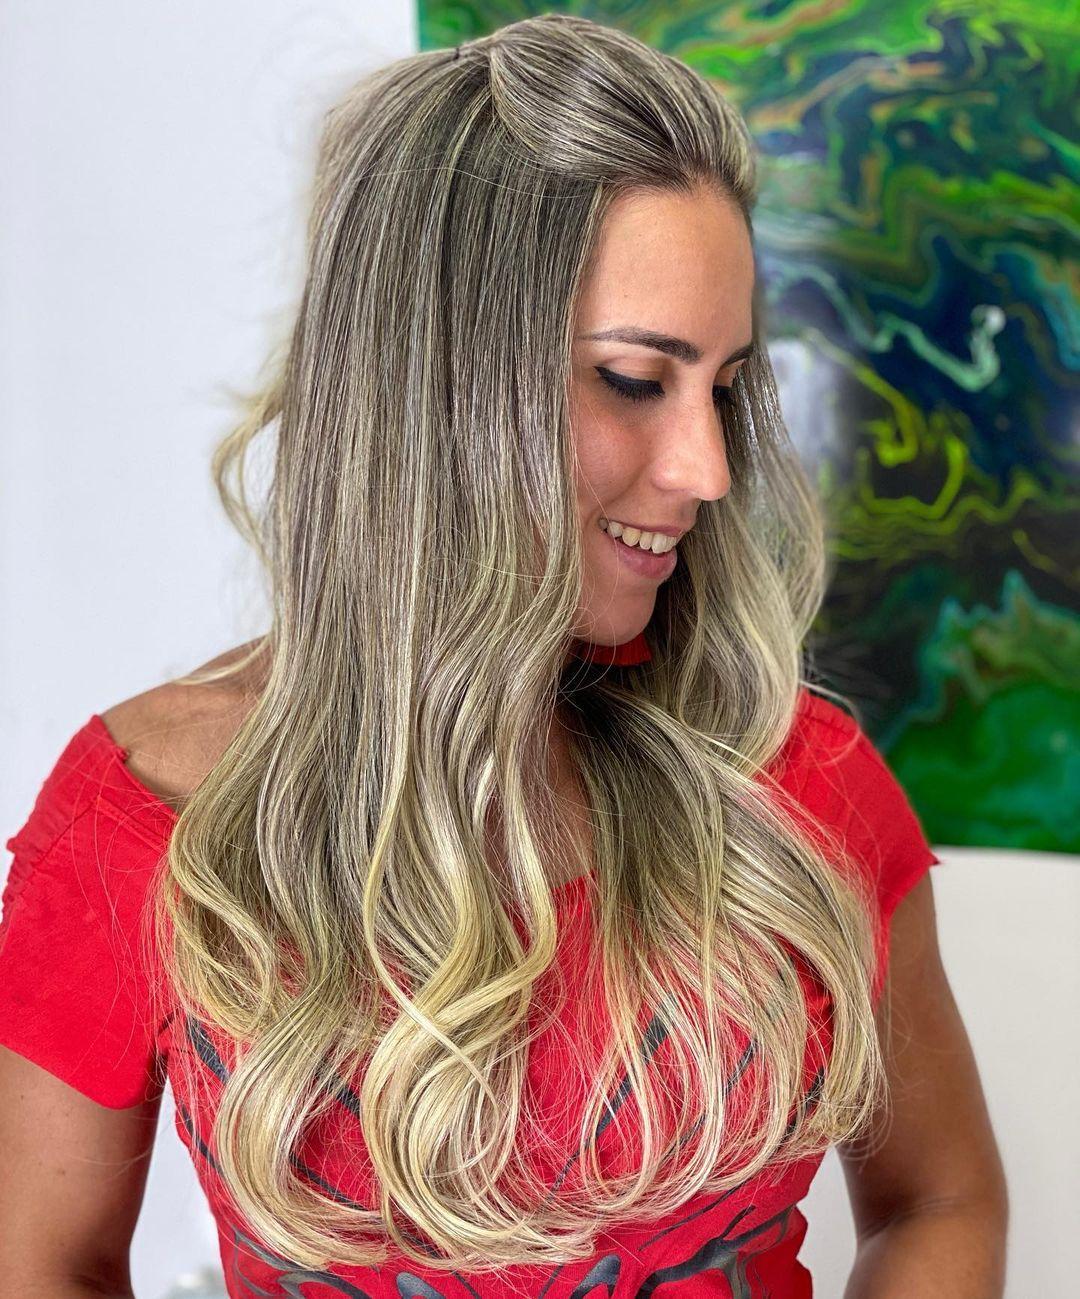 Amanda-Miguez-Wallpapers-Insta-Fit-Bio-5